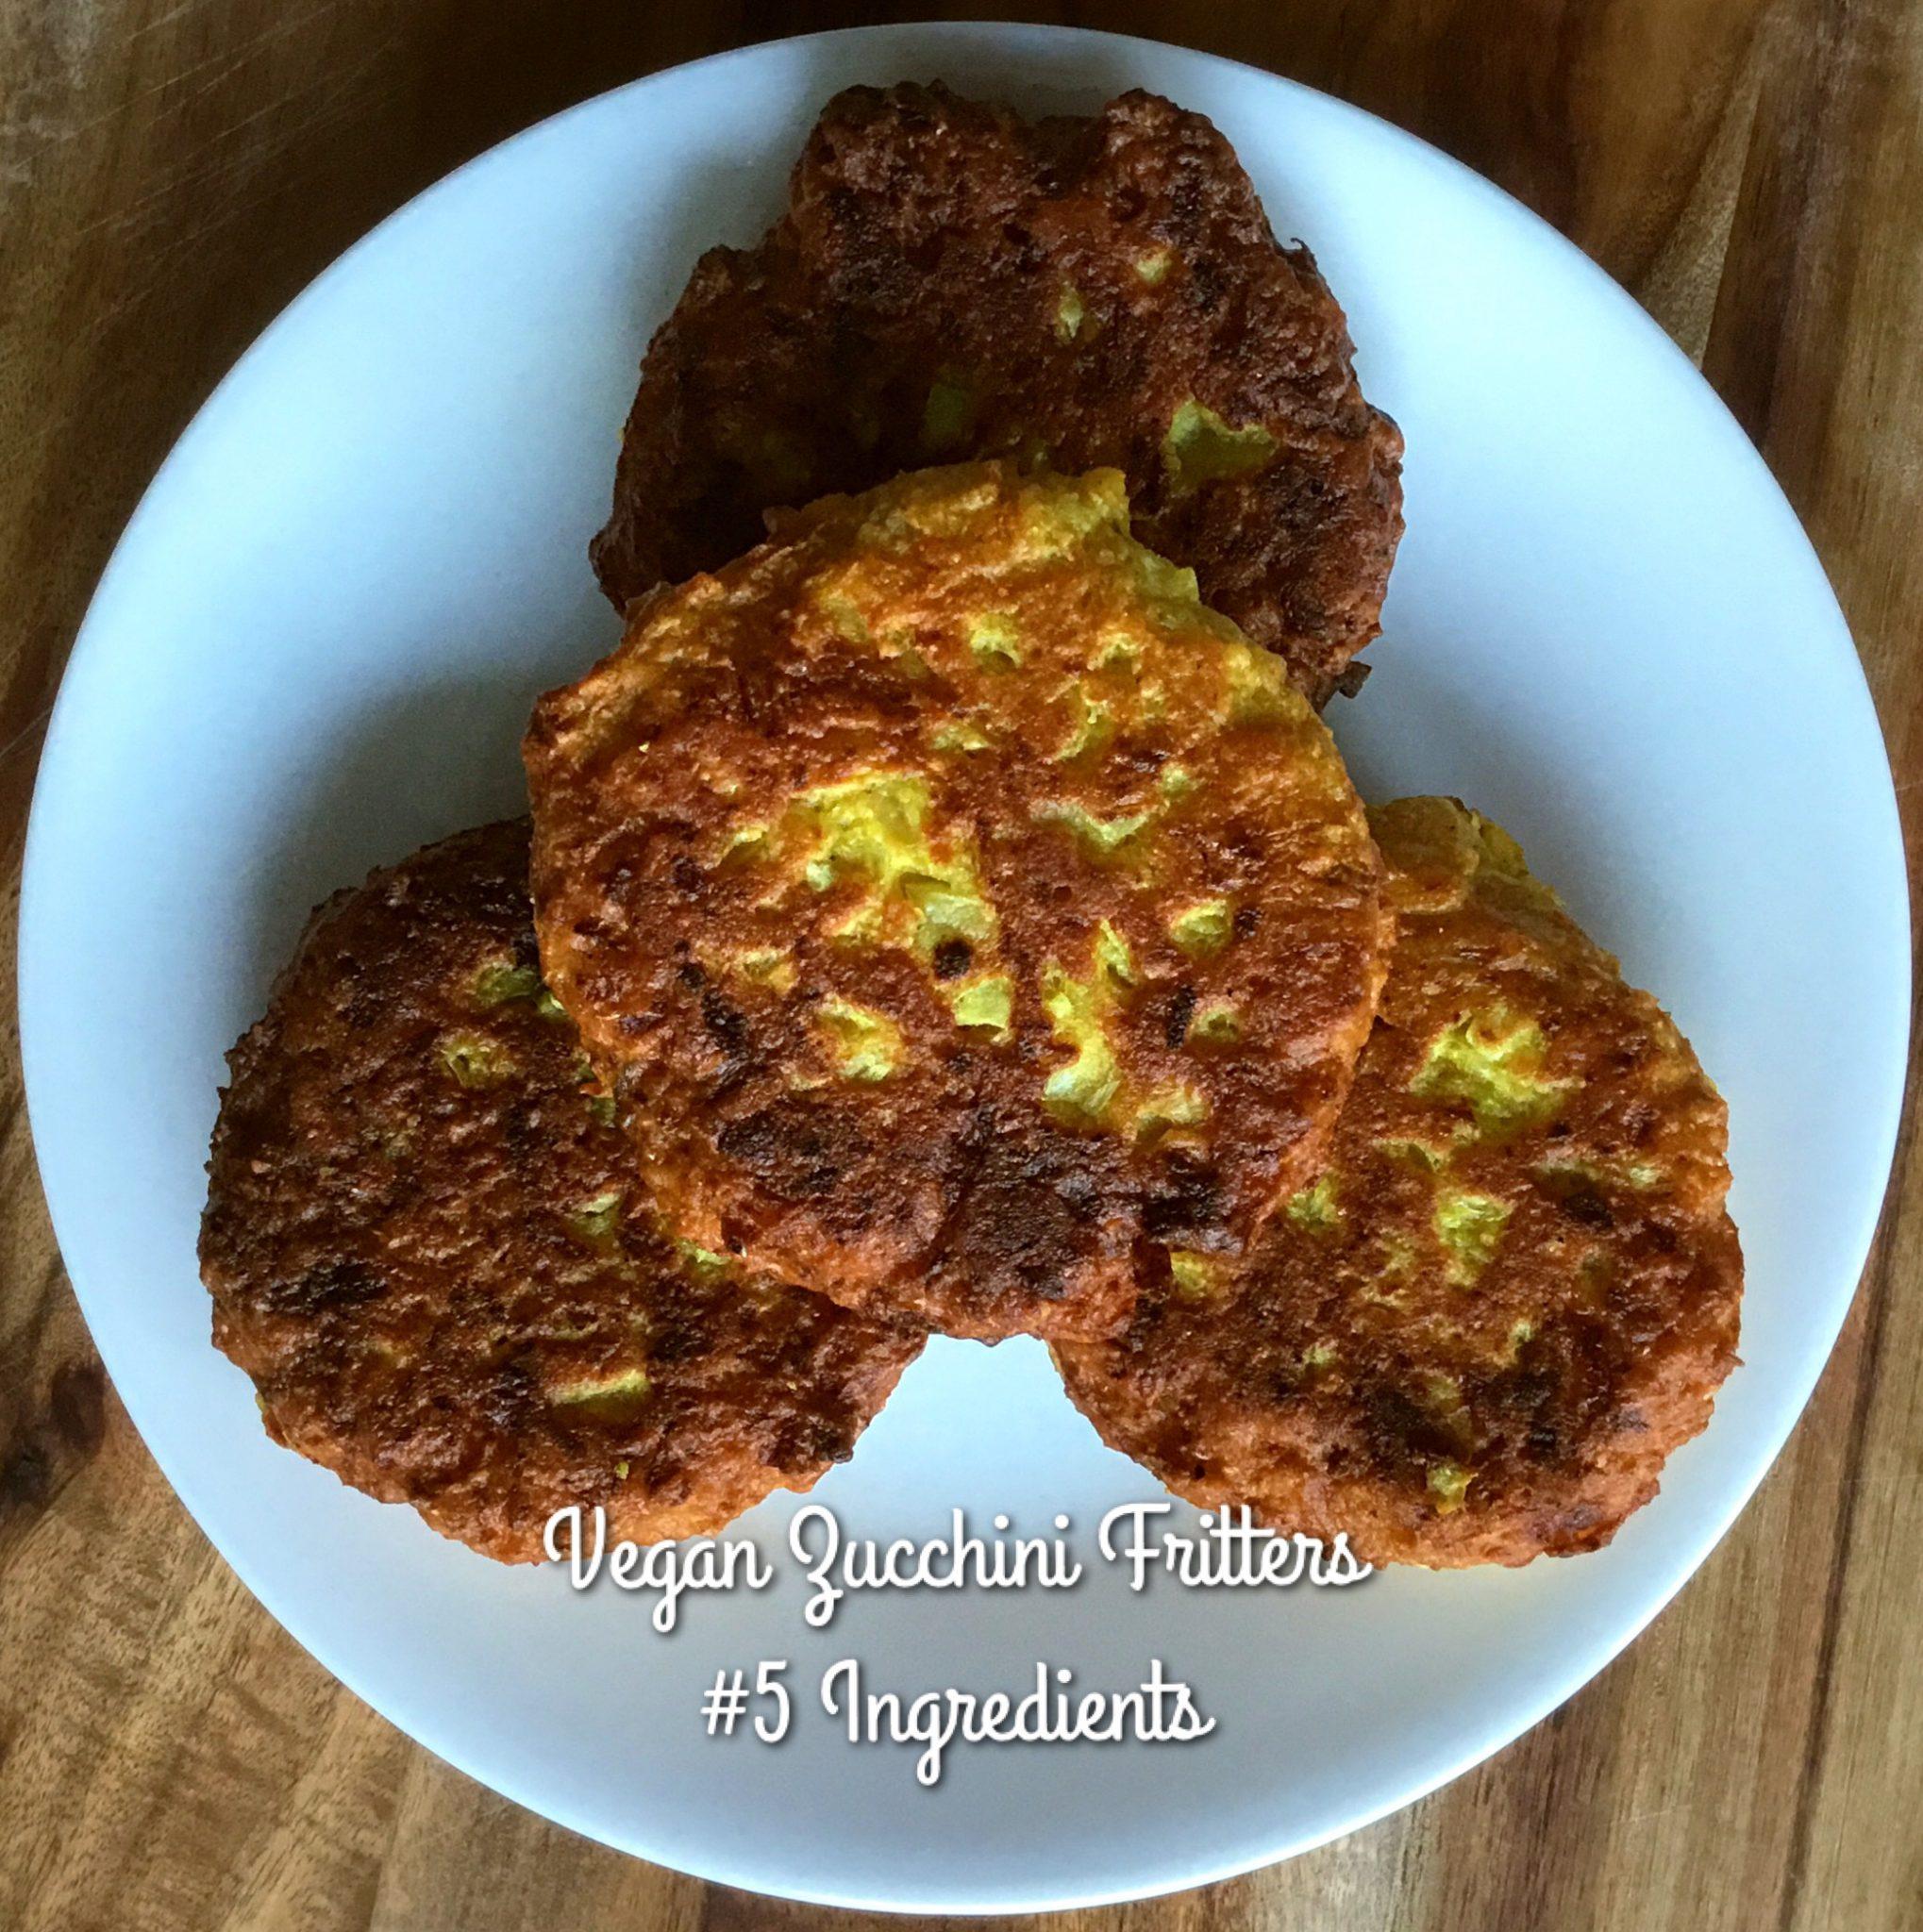 Vegan Zucchini Fritters - 5 Ingredients